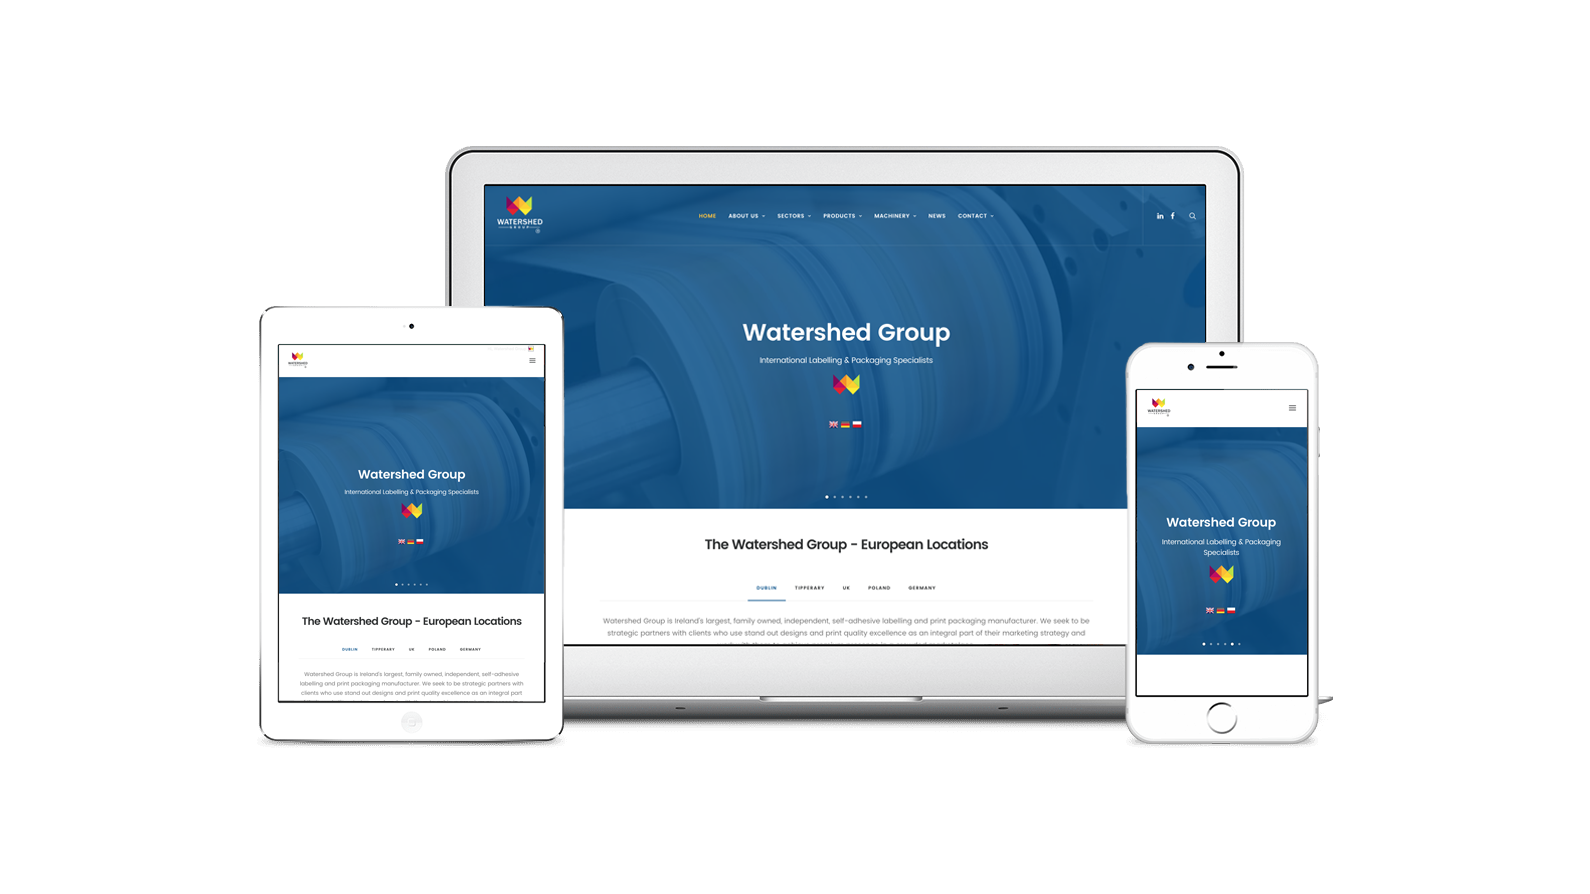 New Website Launch Graphic Macbook iPad iPhone Watershed Group Ireland